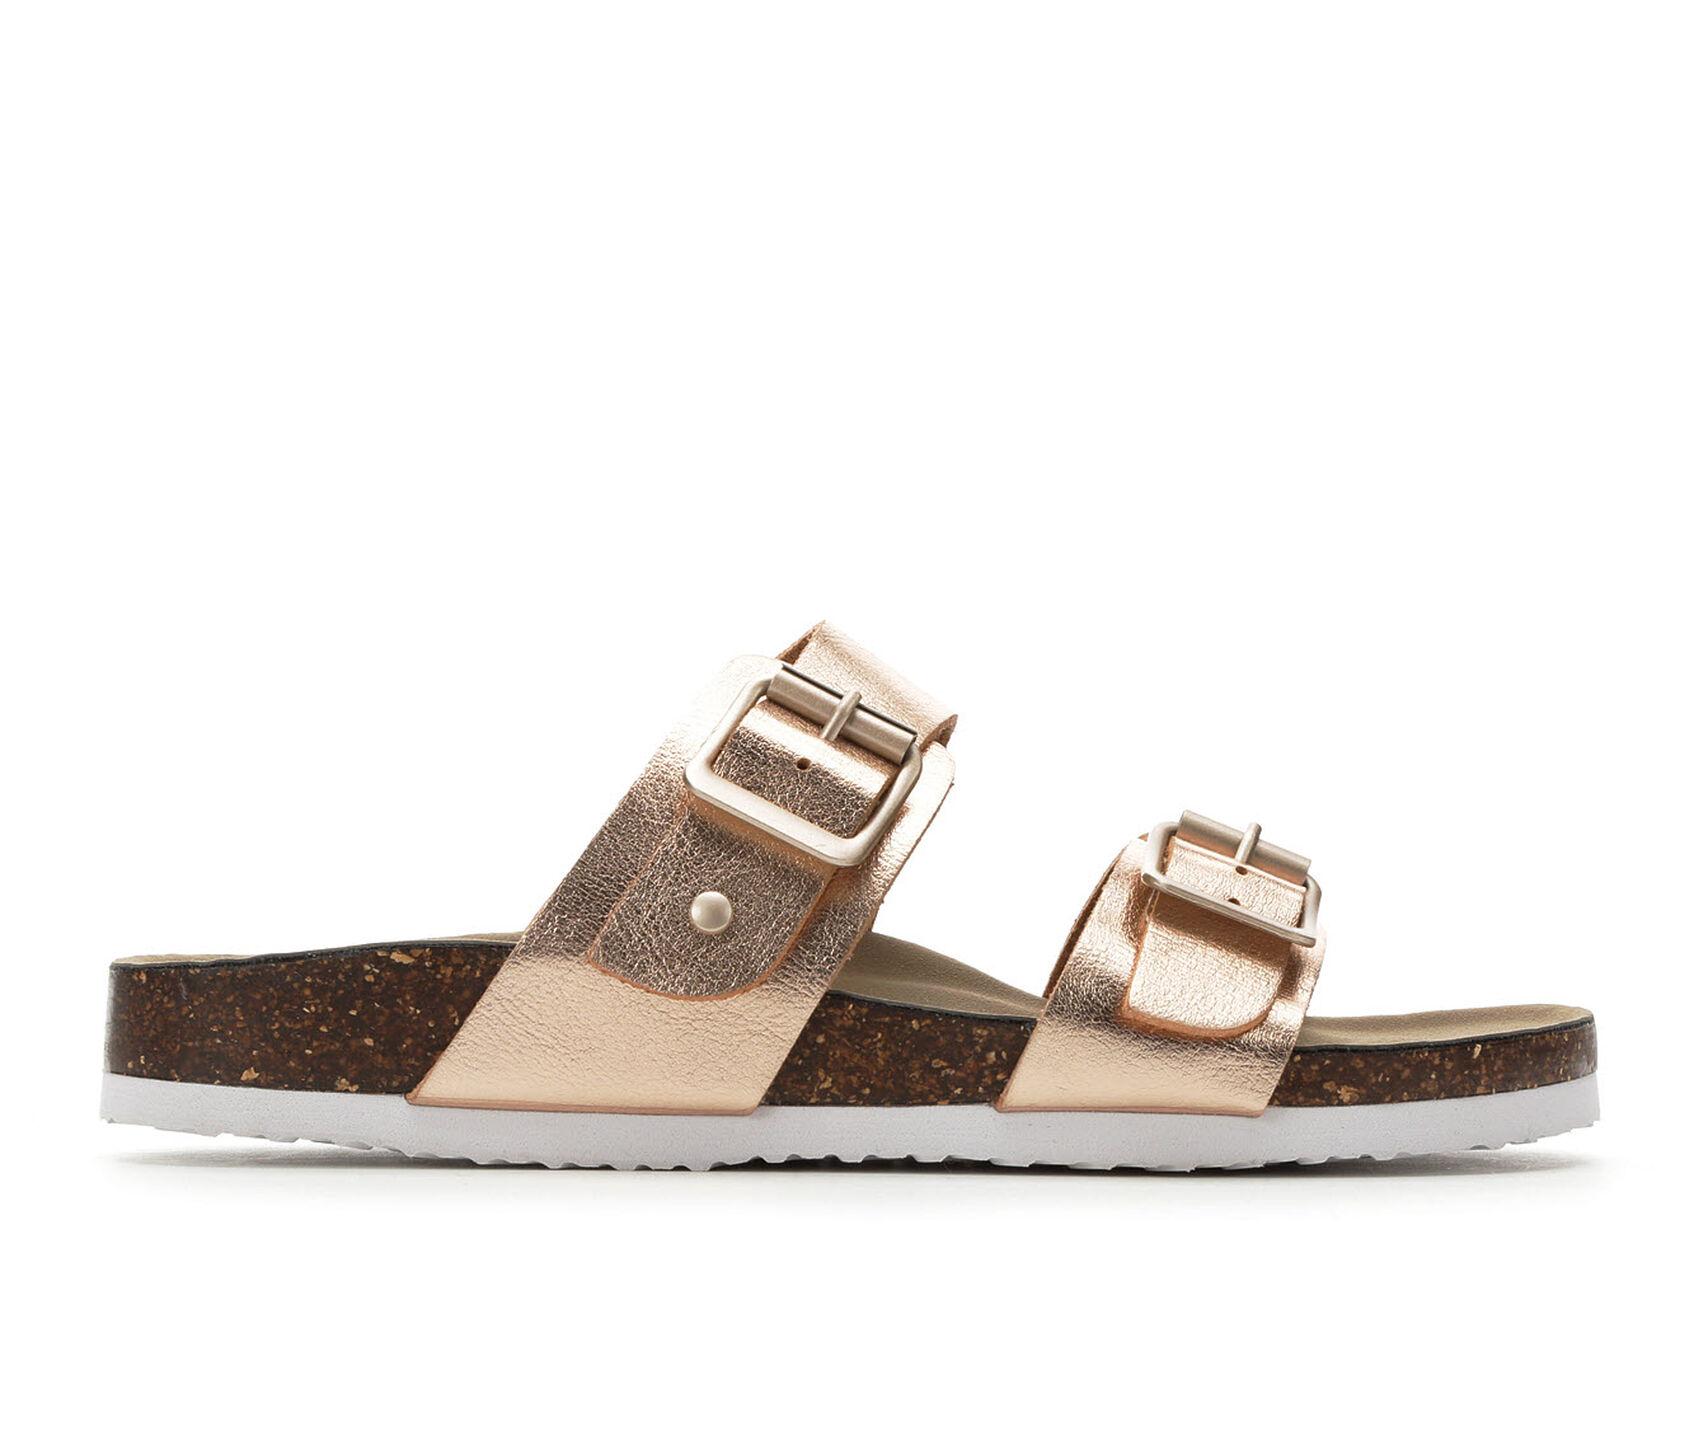 f85910bd41f Women's Madden Girl Brando Footbed Sandals